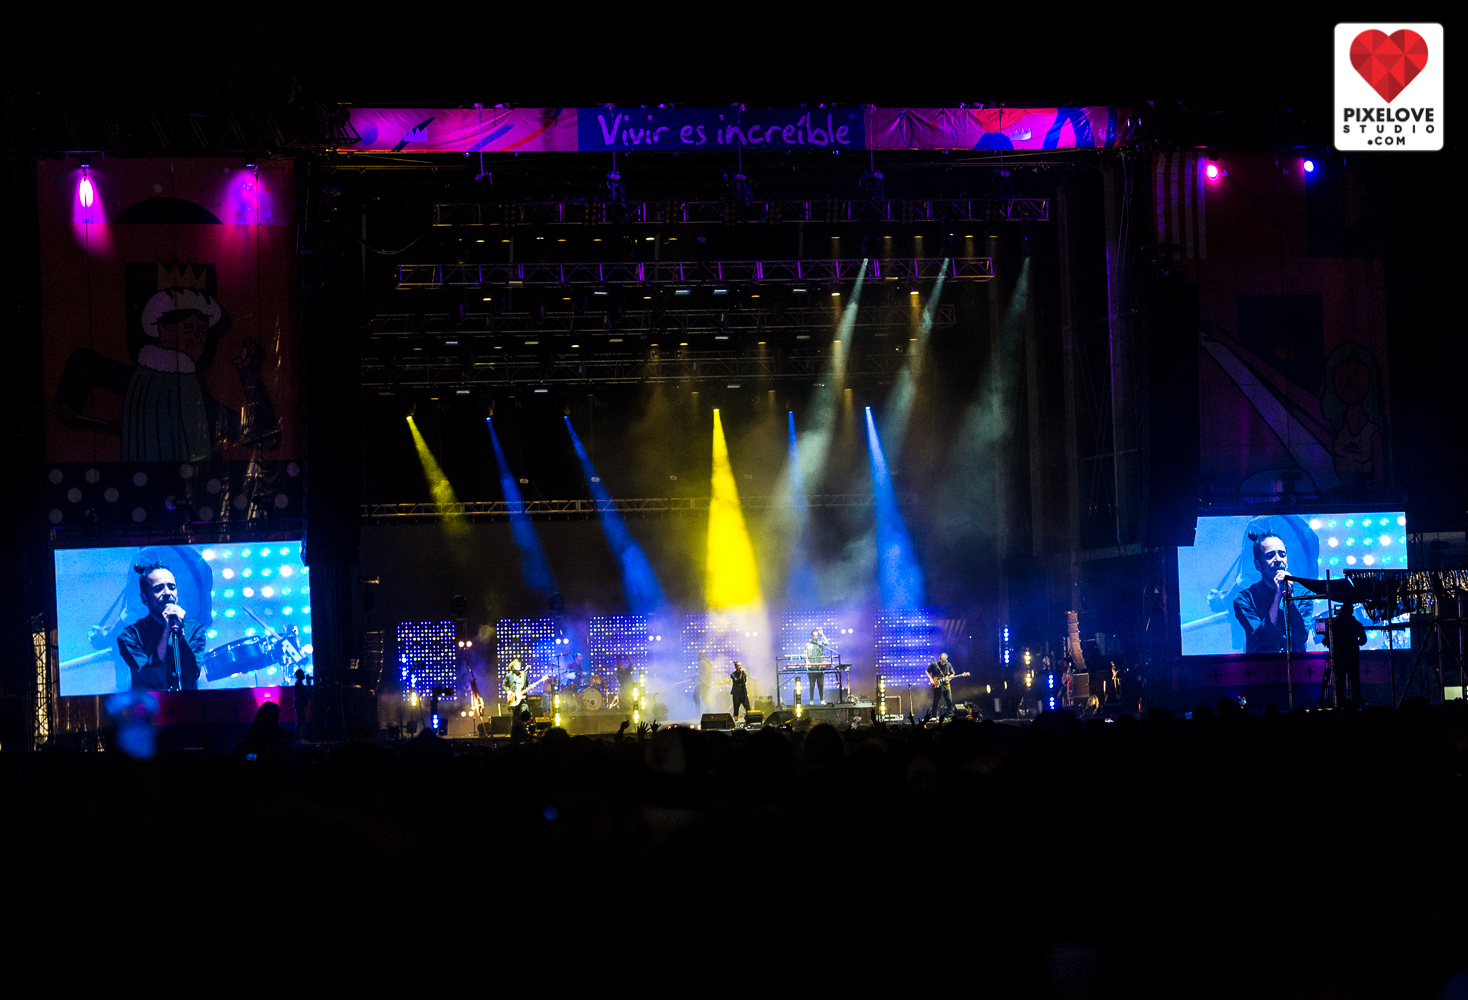 pixelovestudio-foto-conciertos-pulsognp-2018-23